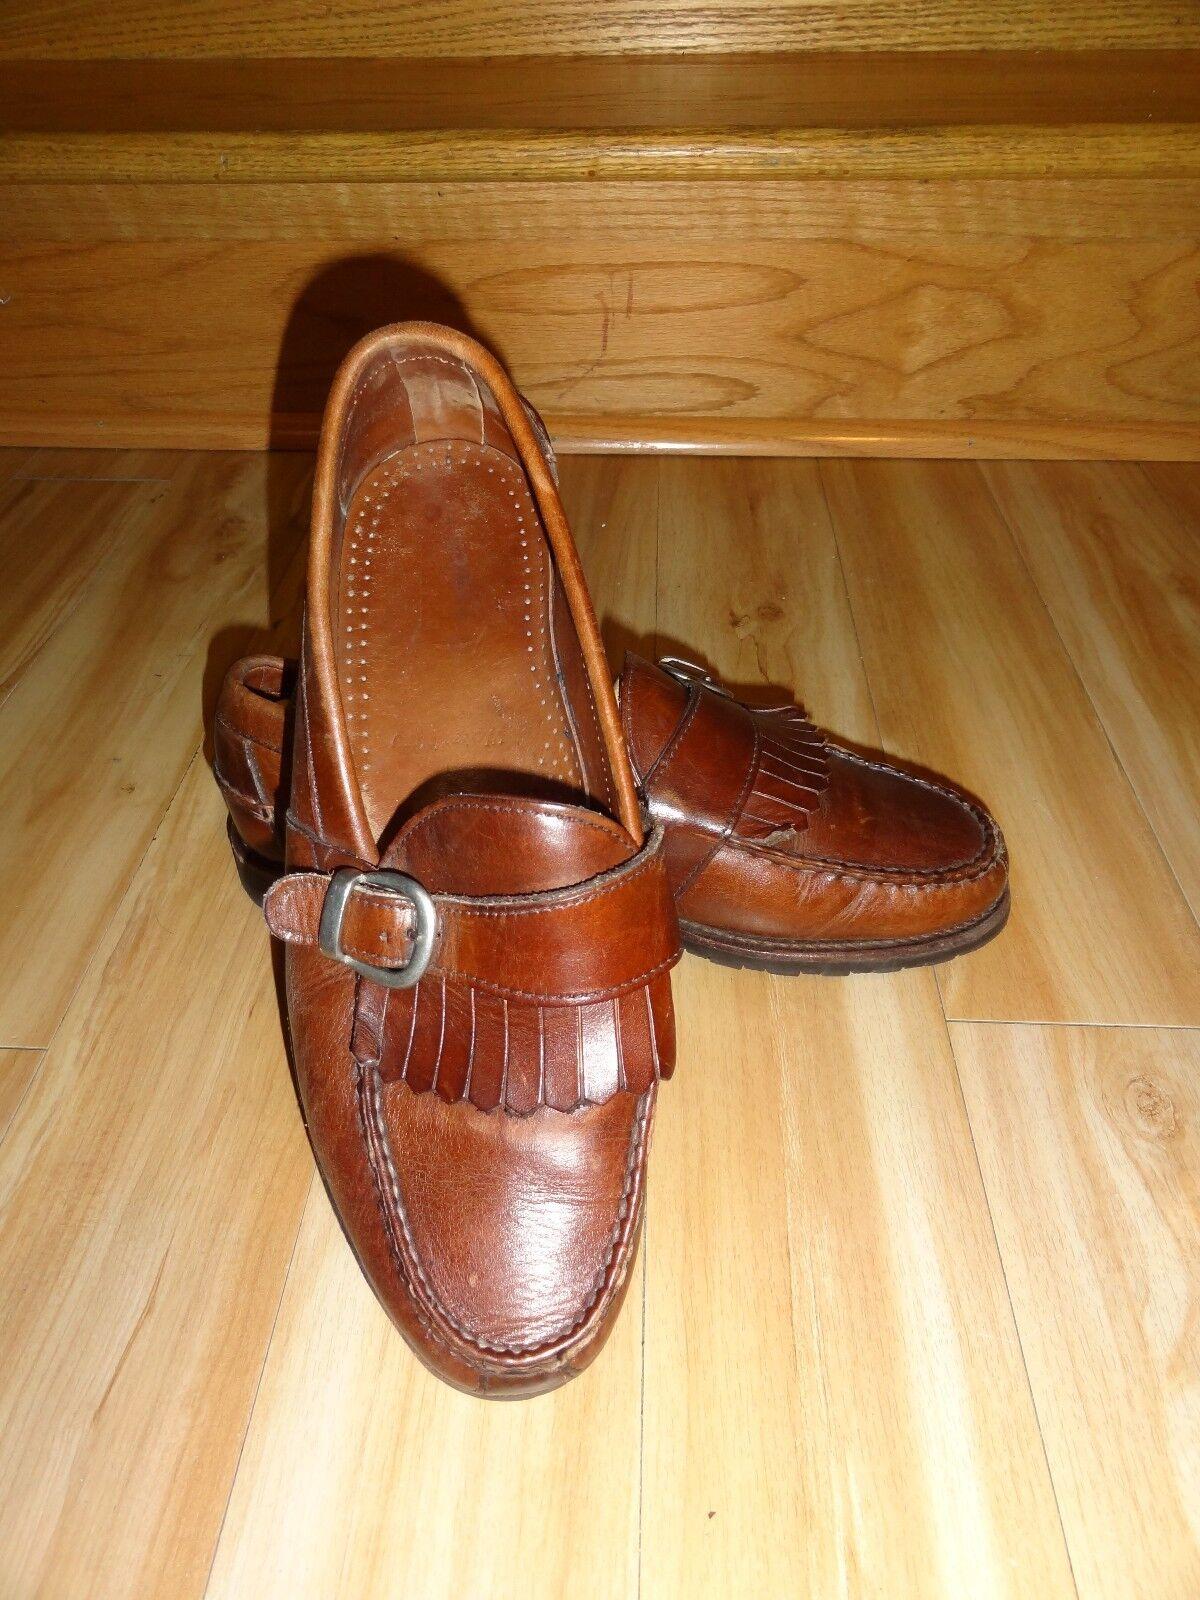 Allen Edmonds Waterbury Brown Leather Buckle Strap Kiltie Loafers 9.5 D USA Made